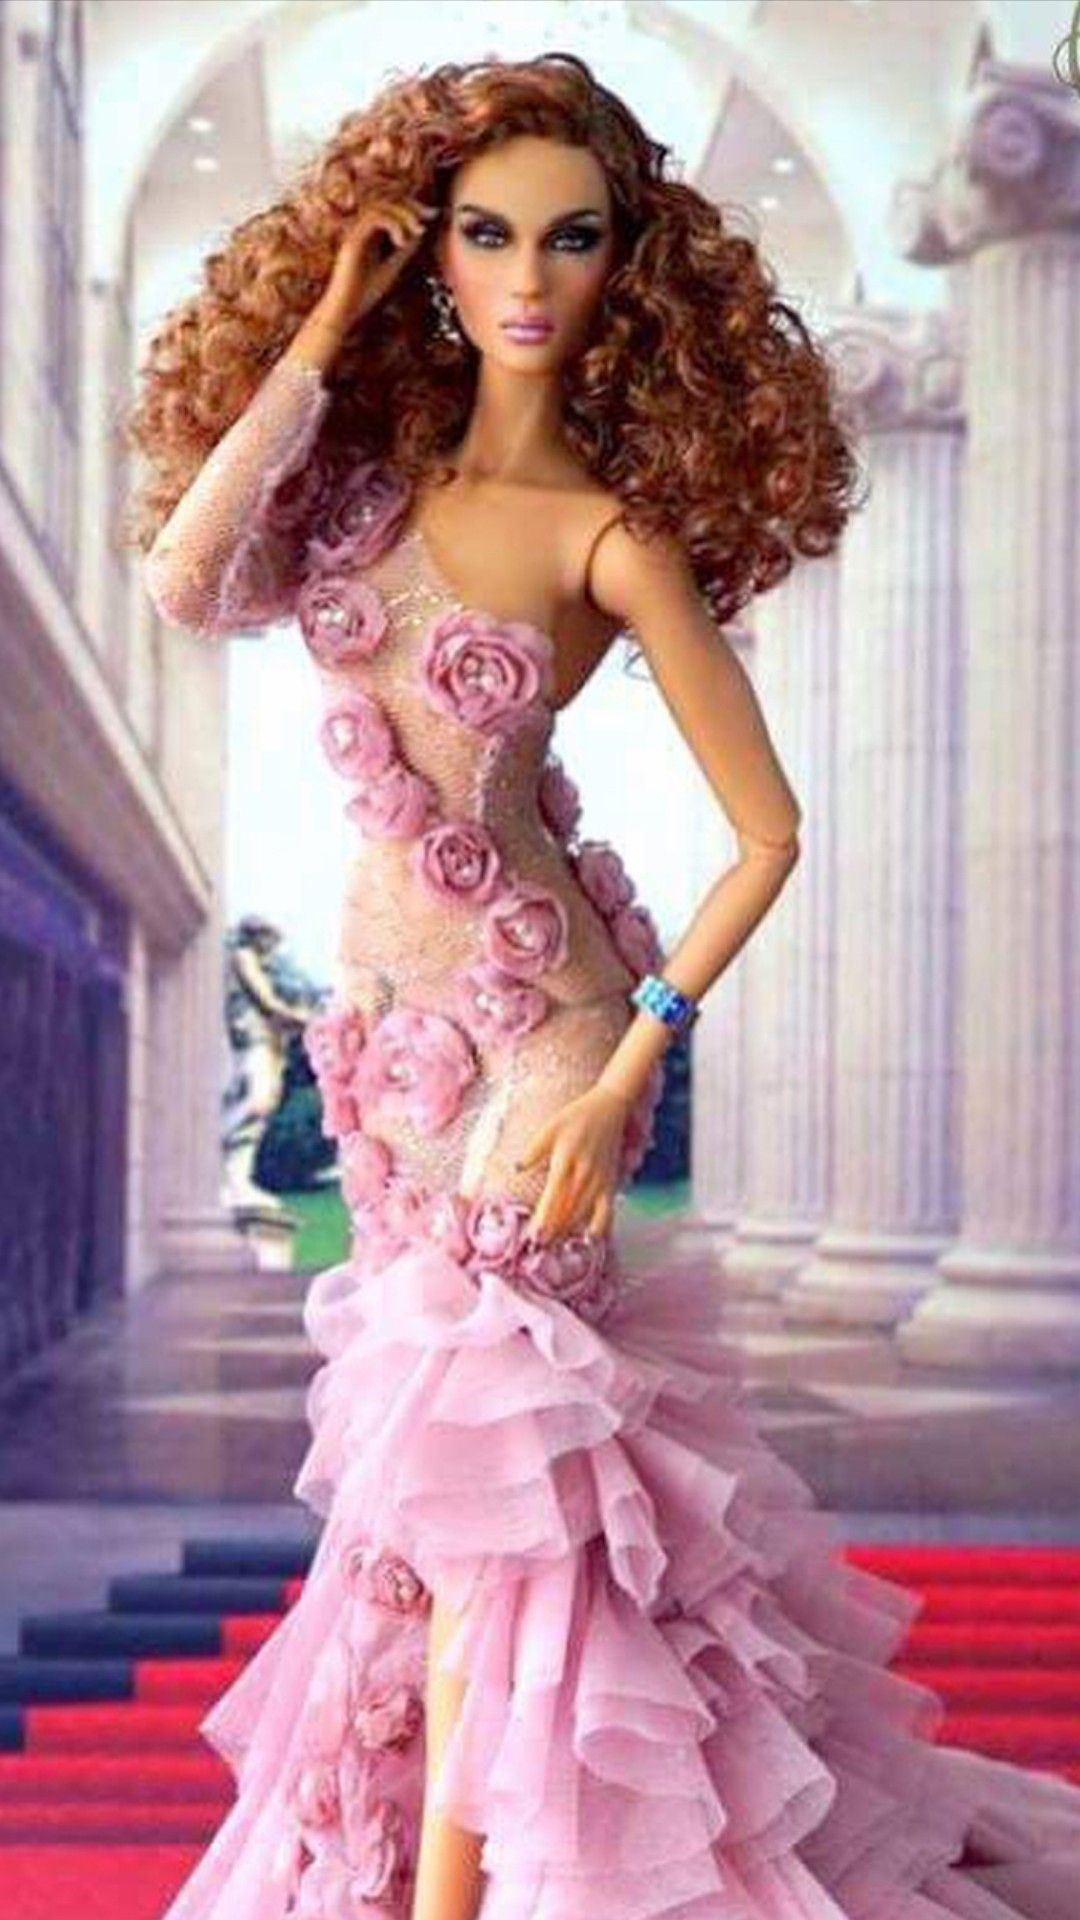 Pin de Rosa Pastrana Saucedo en FASHION DOLL Nº 2 | Pinterest ...